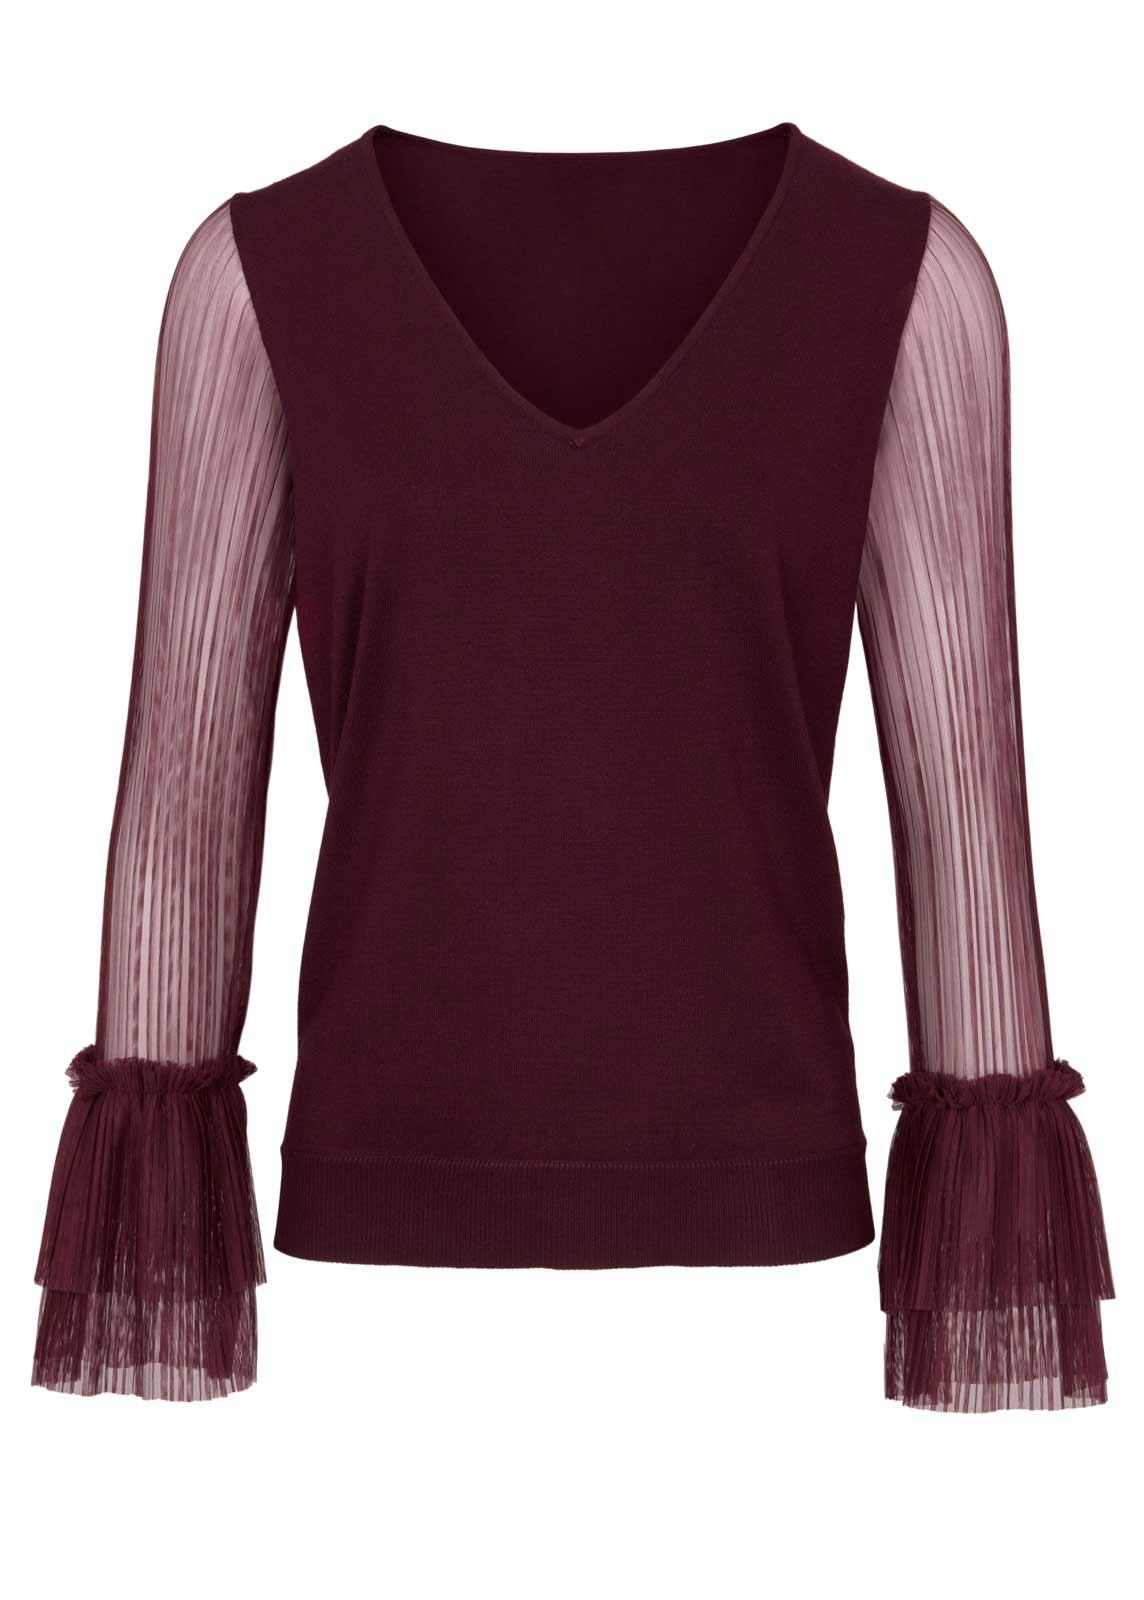 700.886 ASHLEY BROOKE Damen Designer-Pullover m. Plisseeärmeln Bordeaux